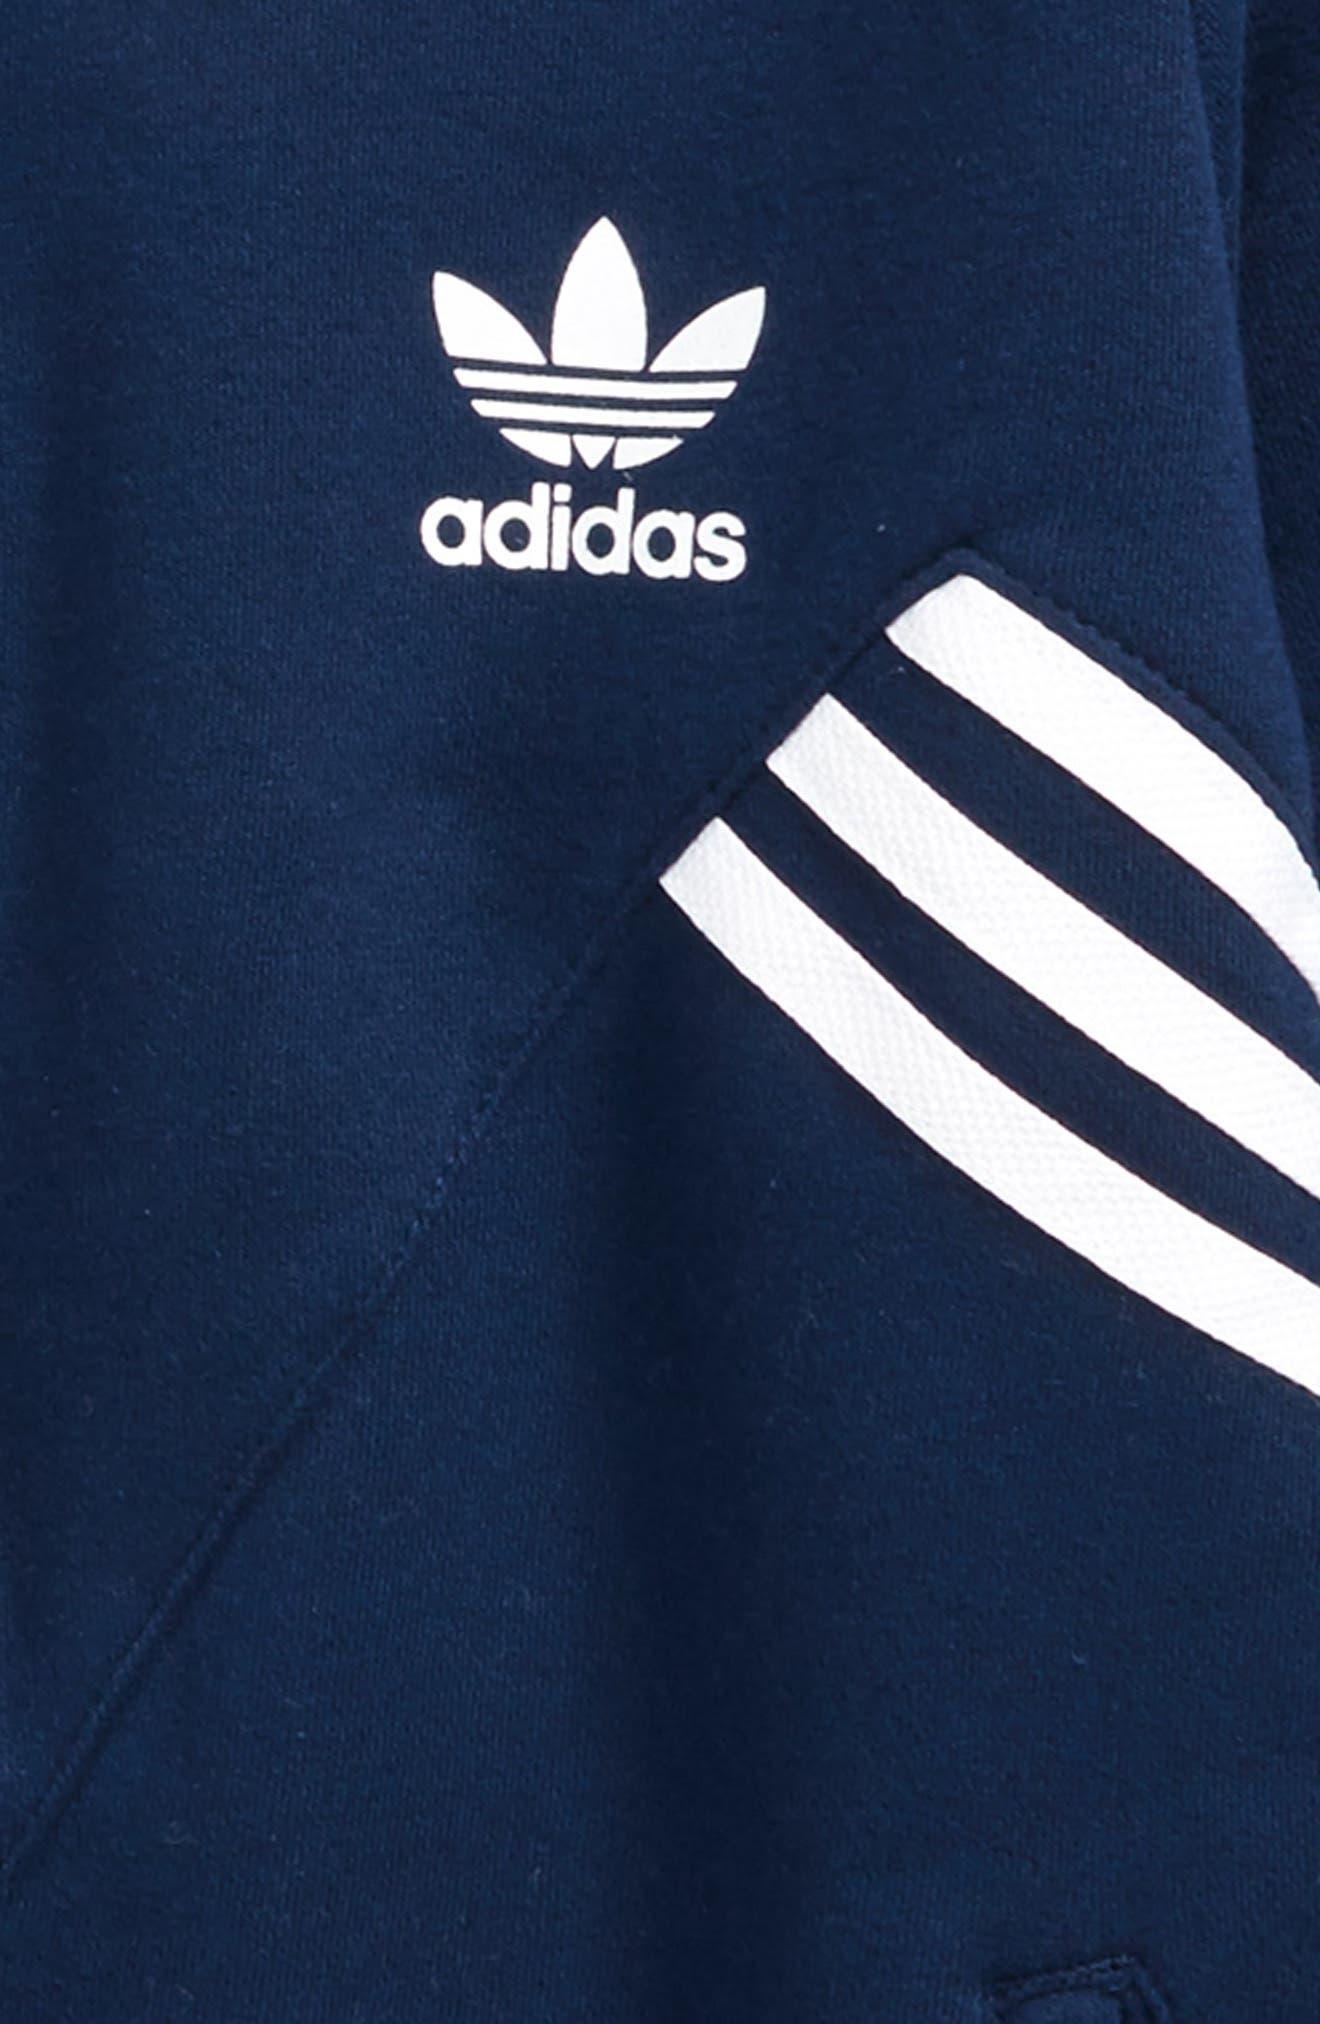 adidas SST Track Jacket,                             Alternate thumbnail 2, color,                             Collegiate Navy/ Medium Grey